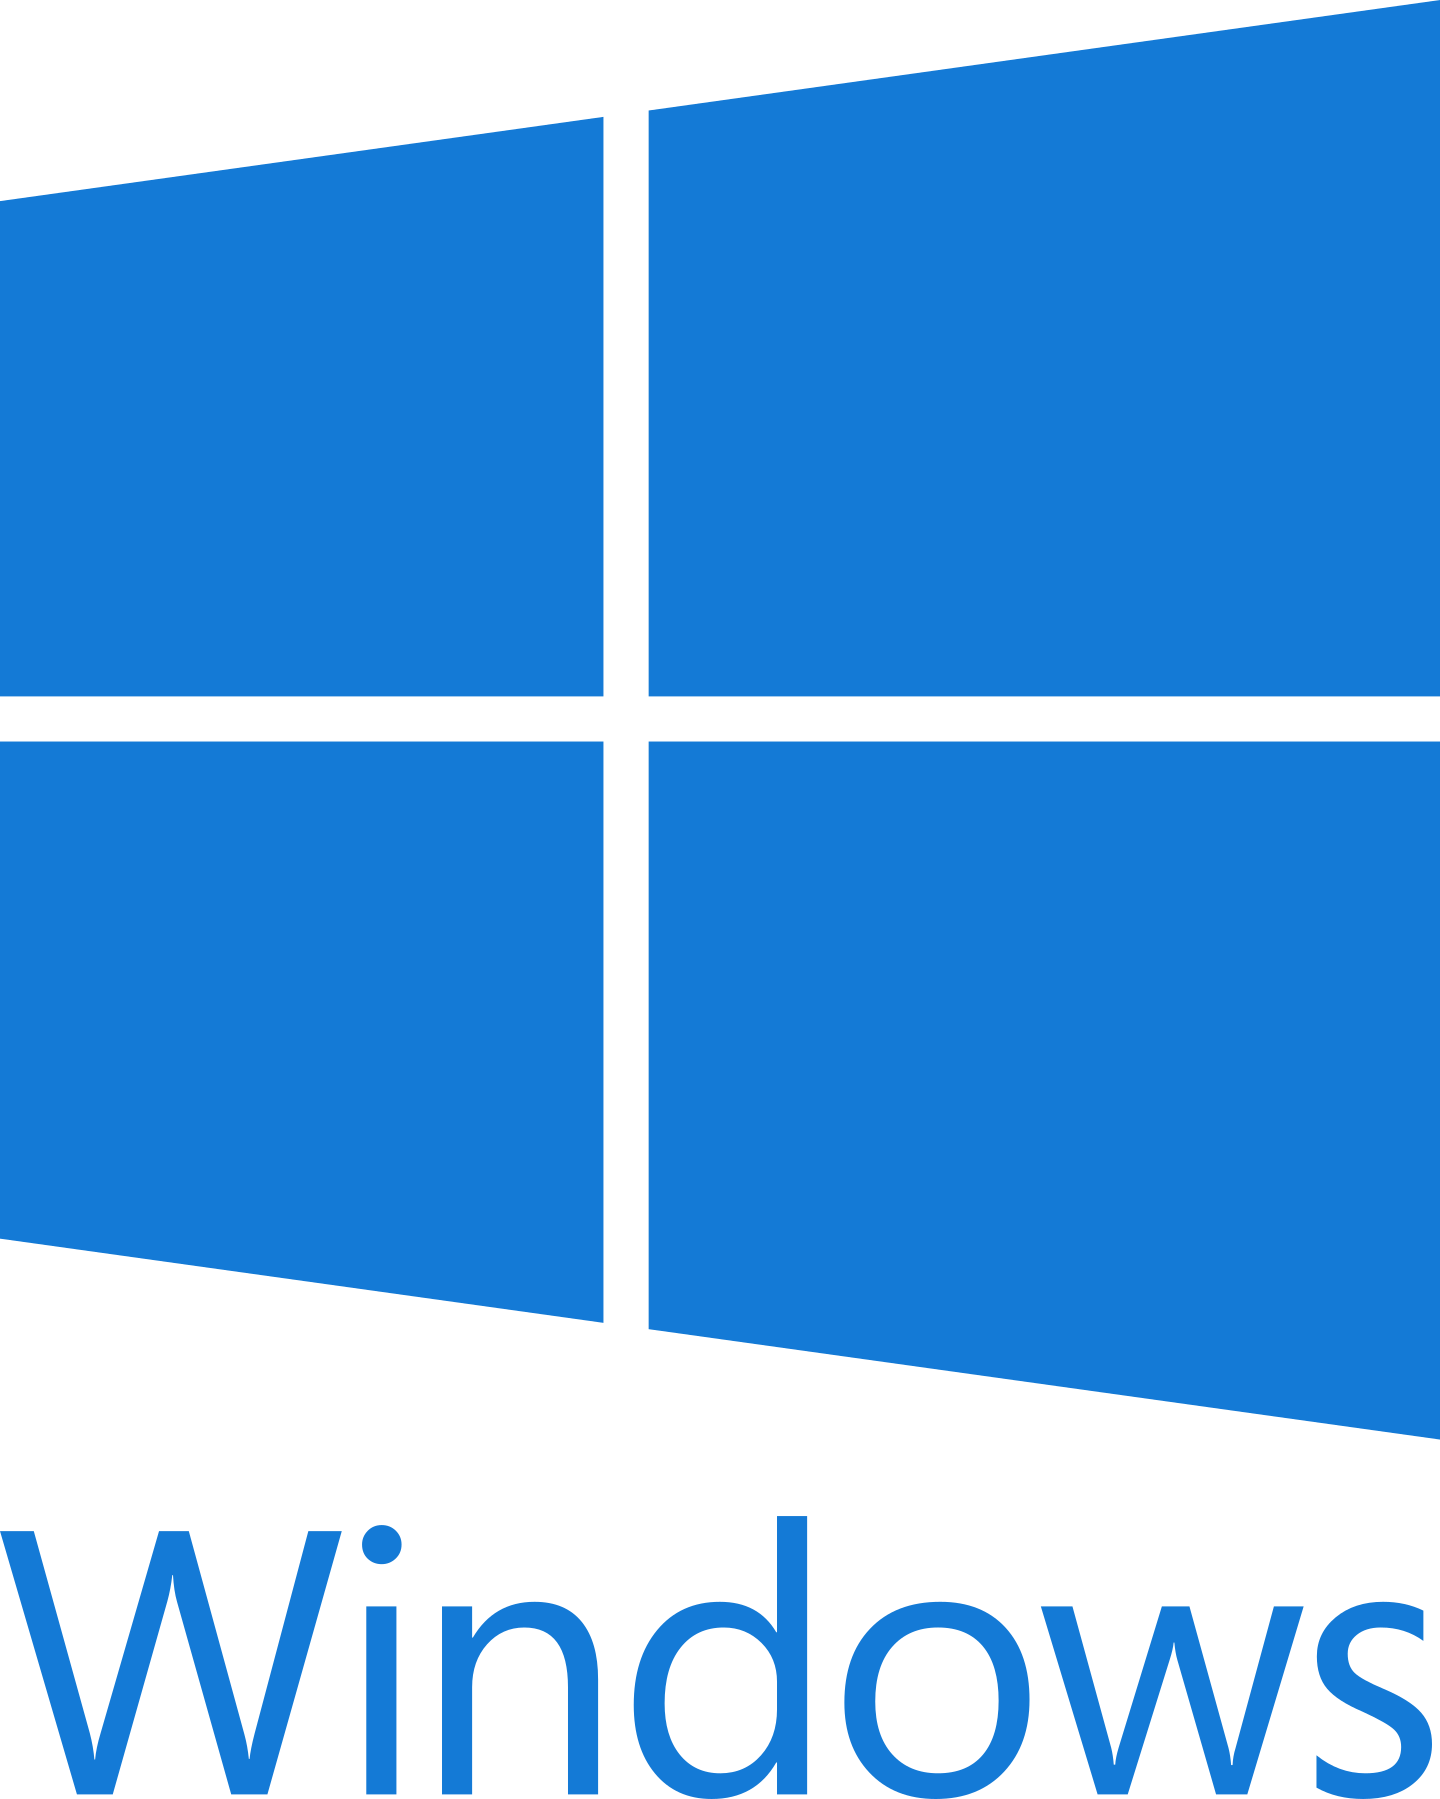 windows logo 2 - Windows Logo